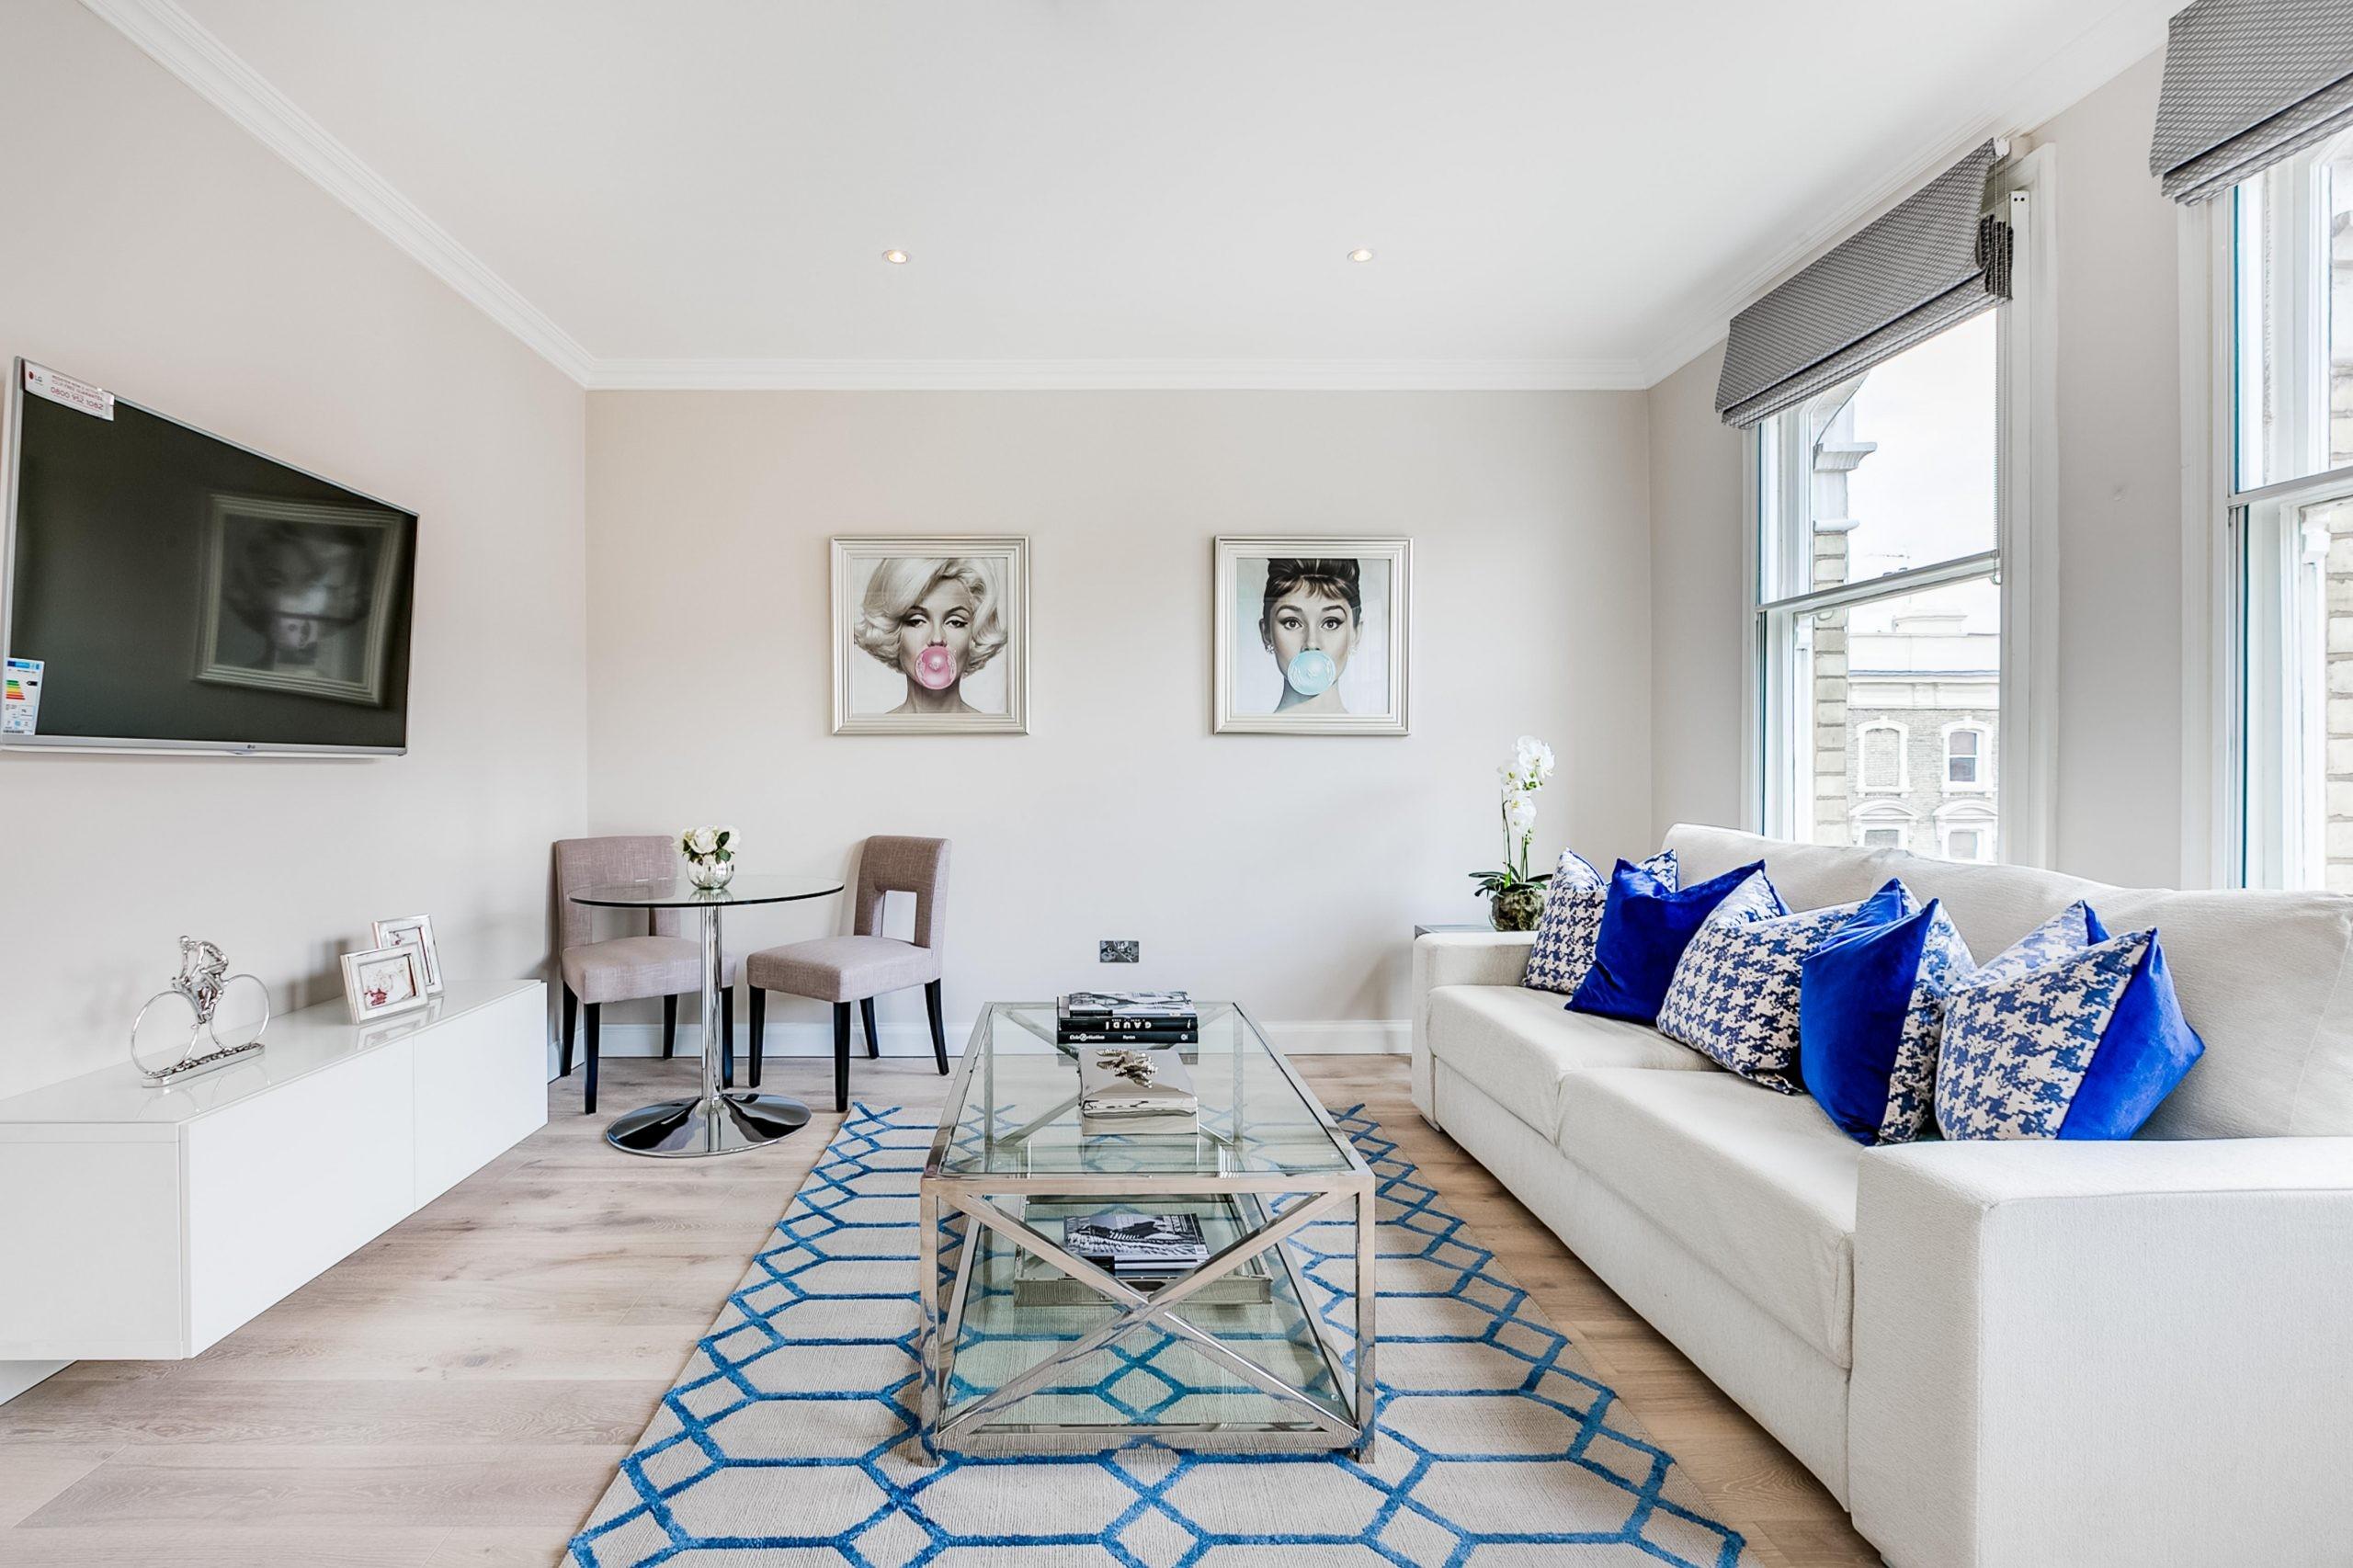 Fulham Road - Residential Property Development